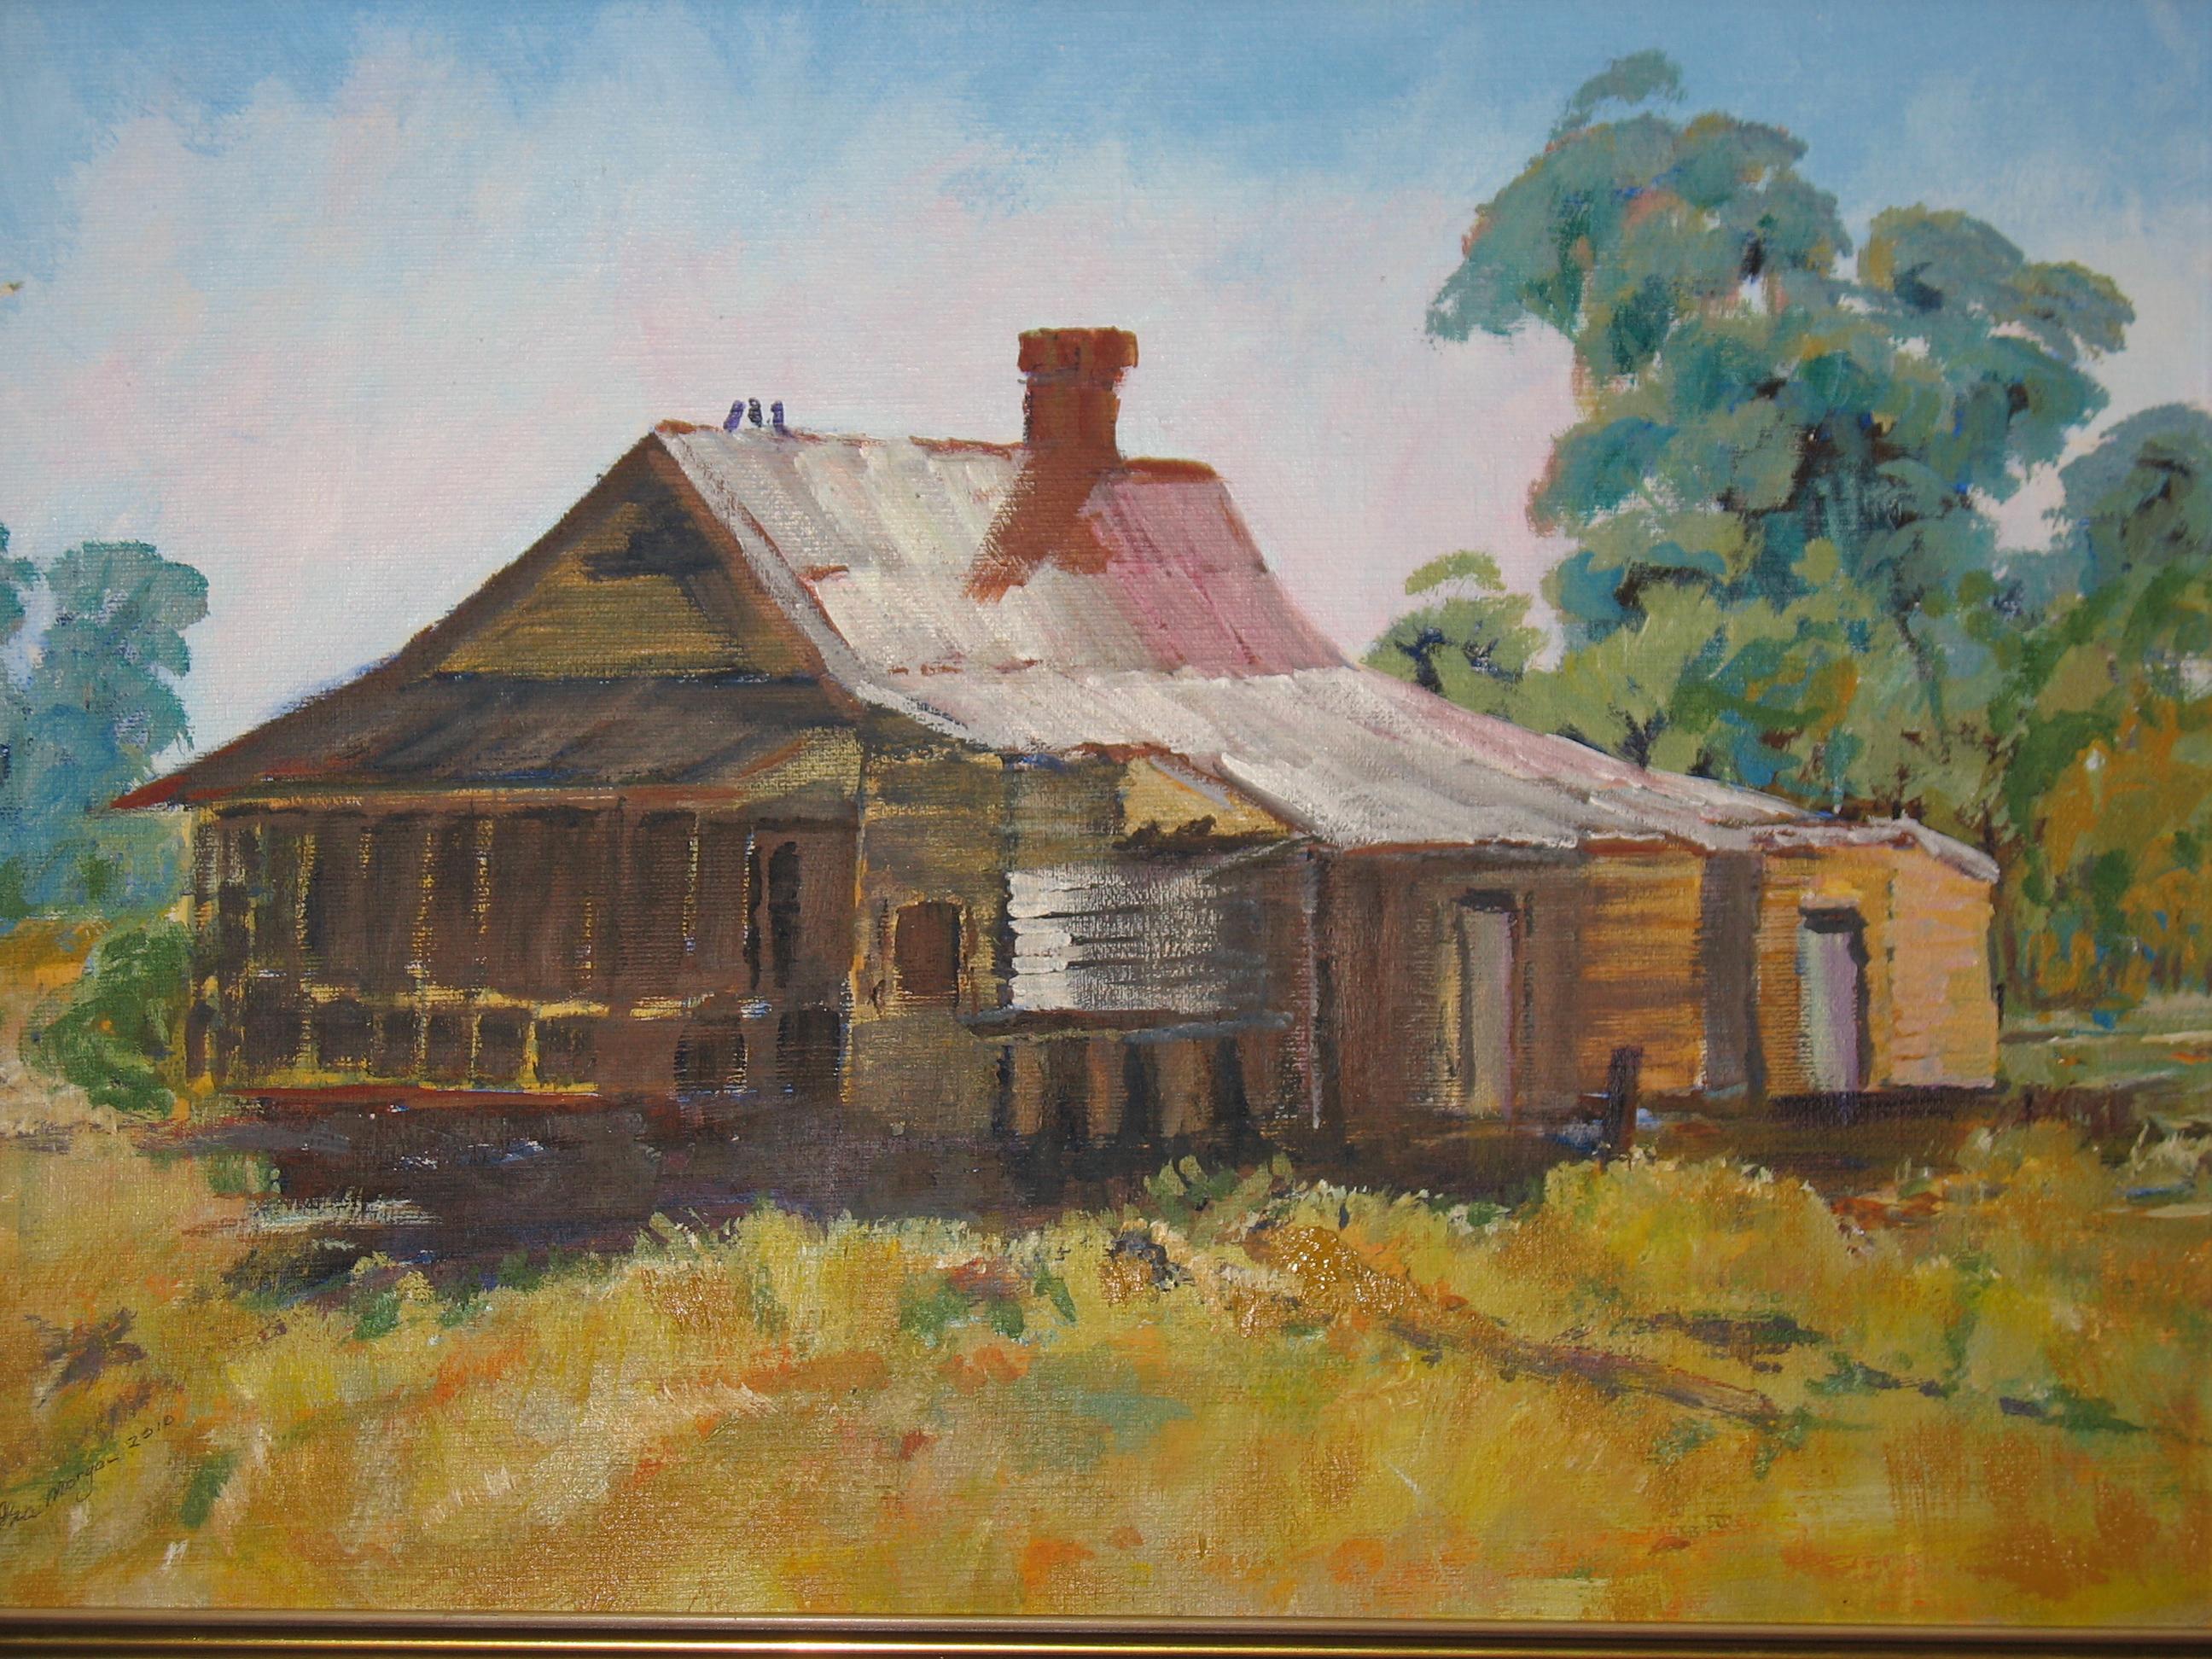 83. ' Old railway house Gilgandra '